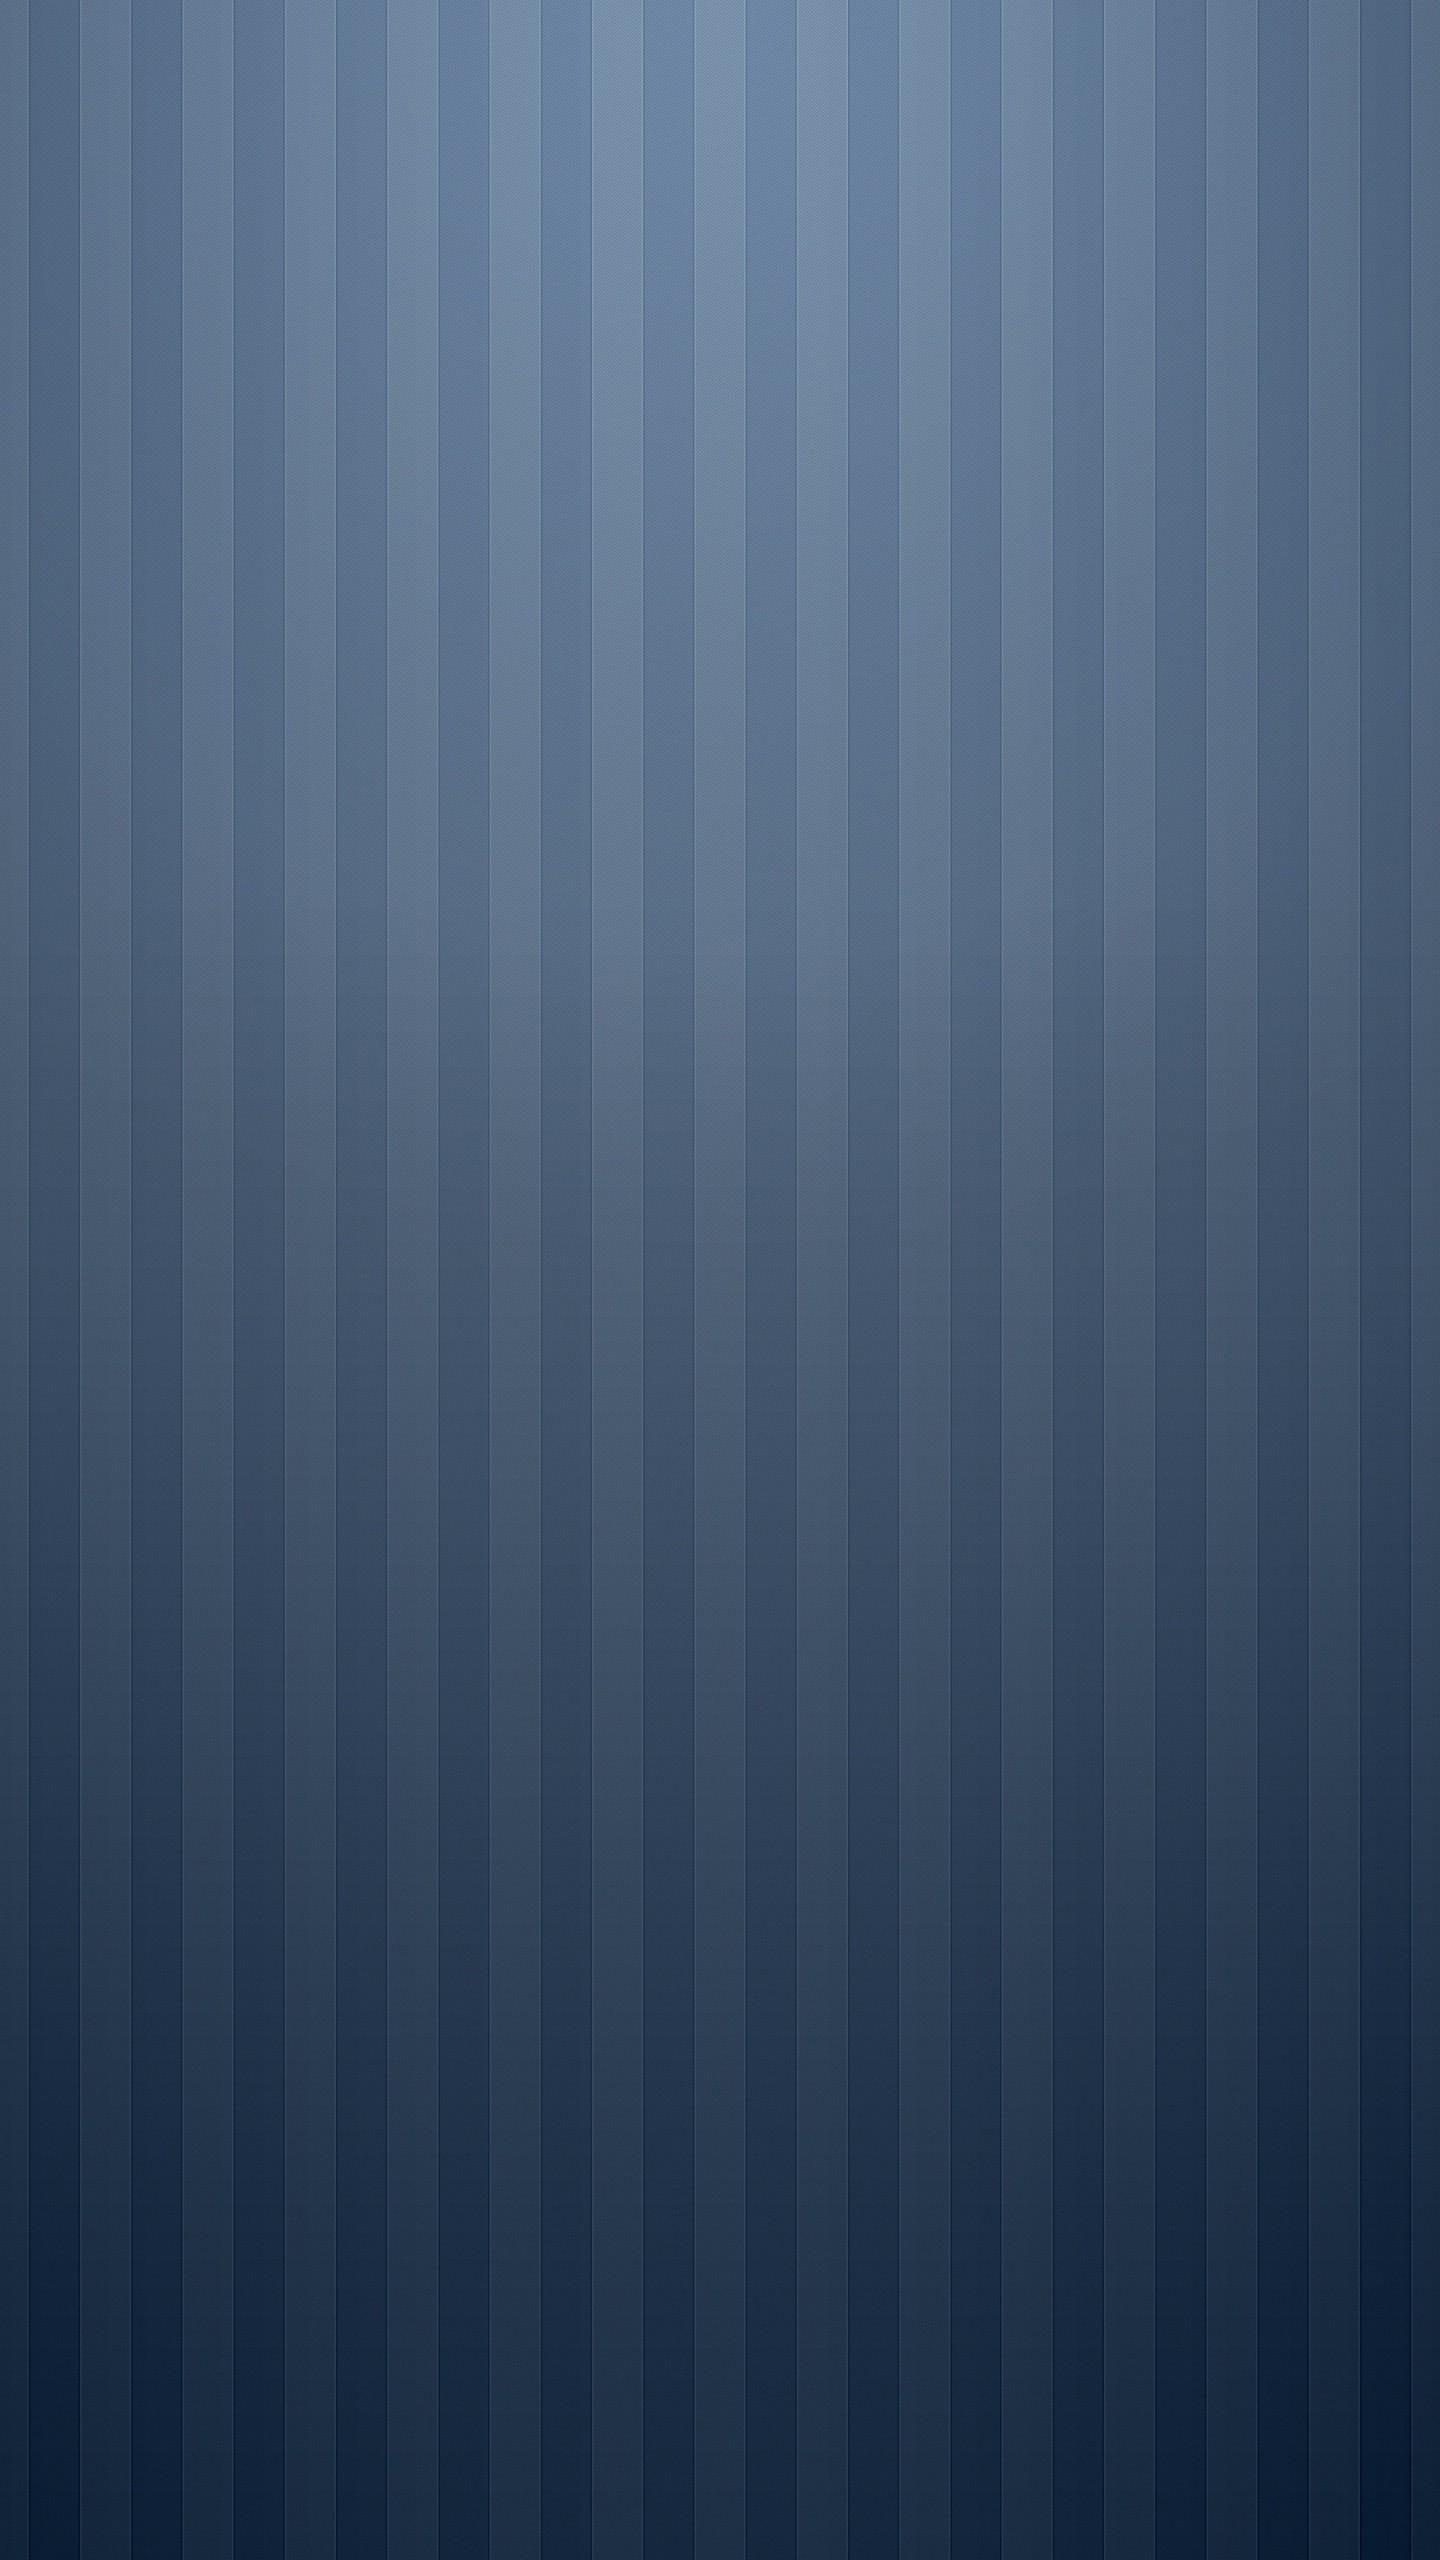 Wallpaper blue, stripes, vertical, dark